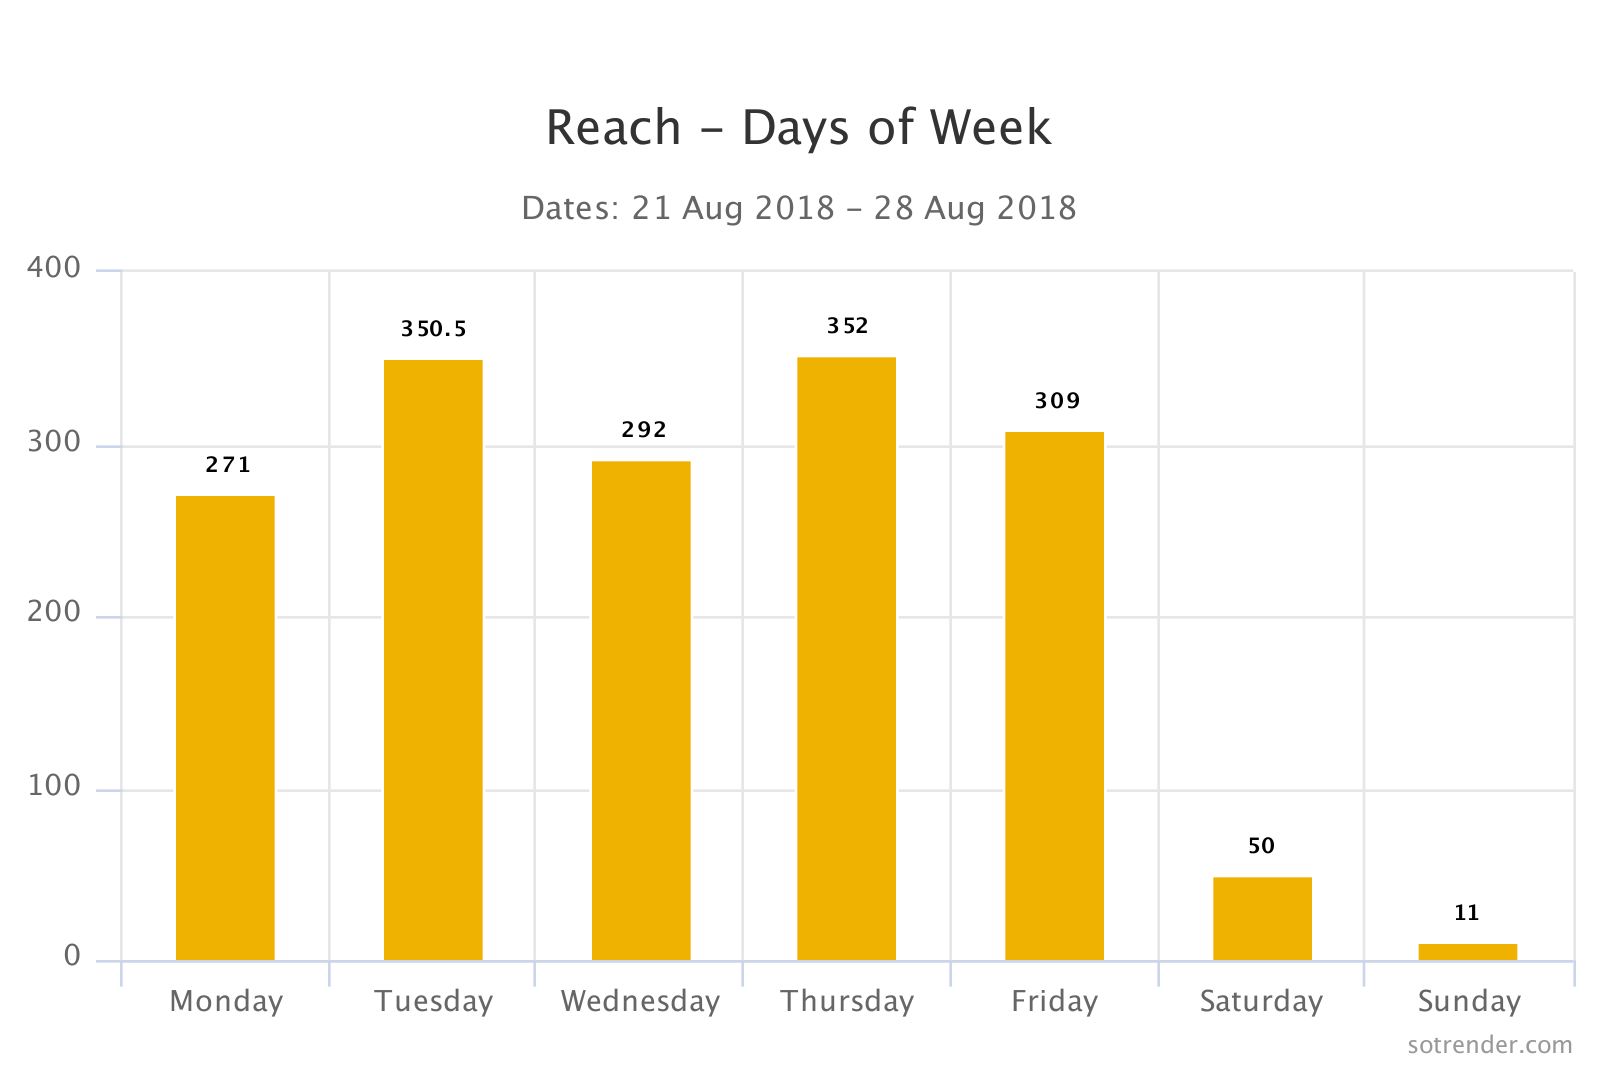 Reach - days of week